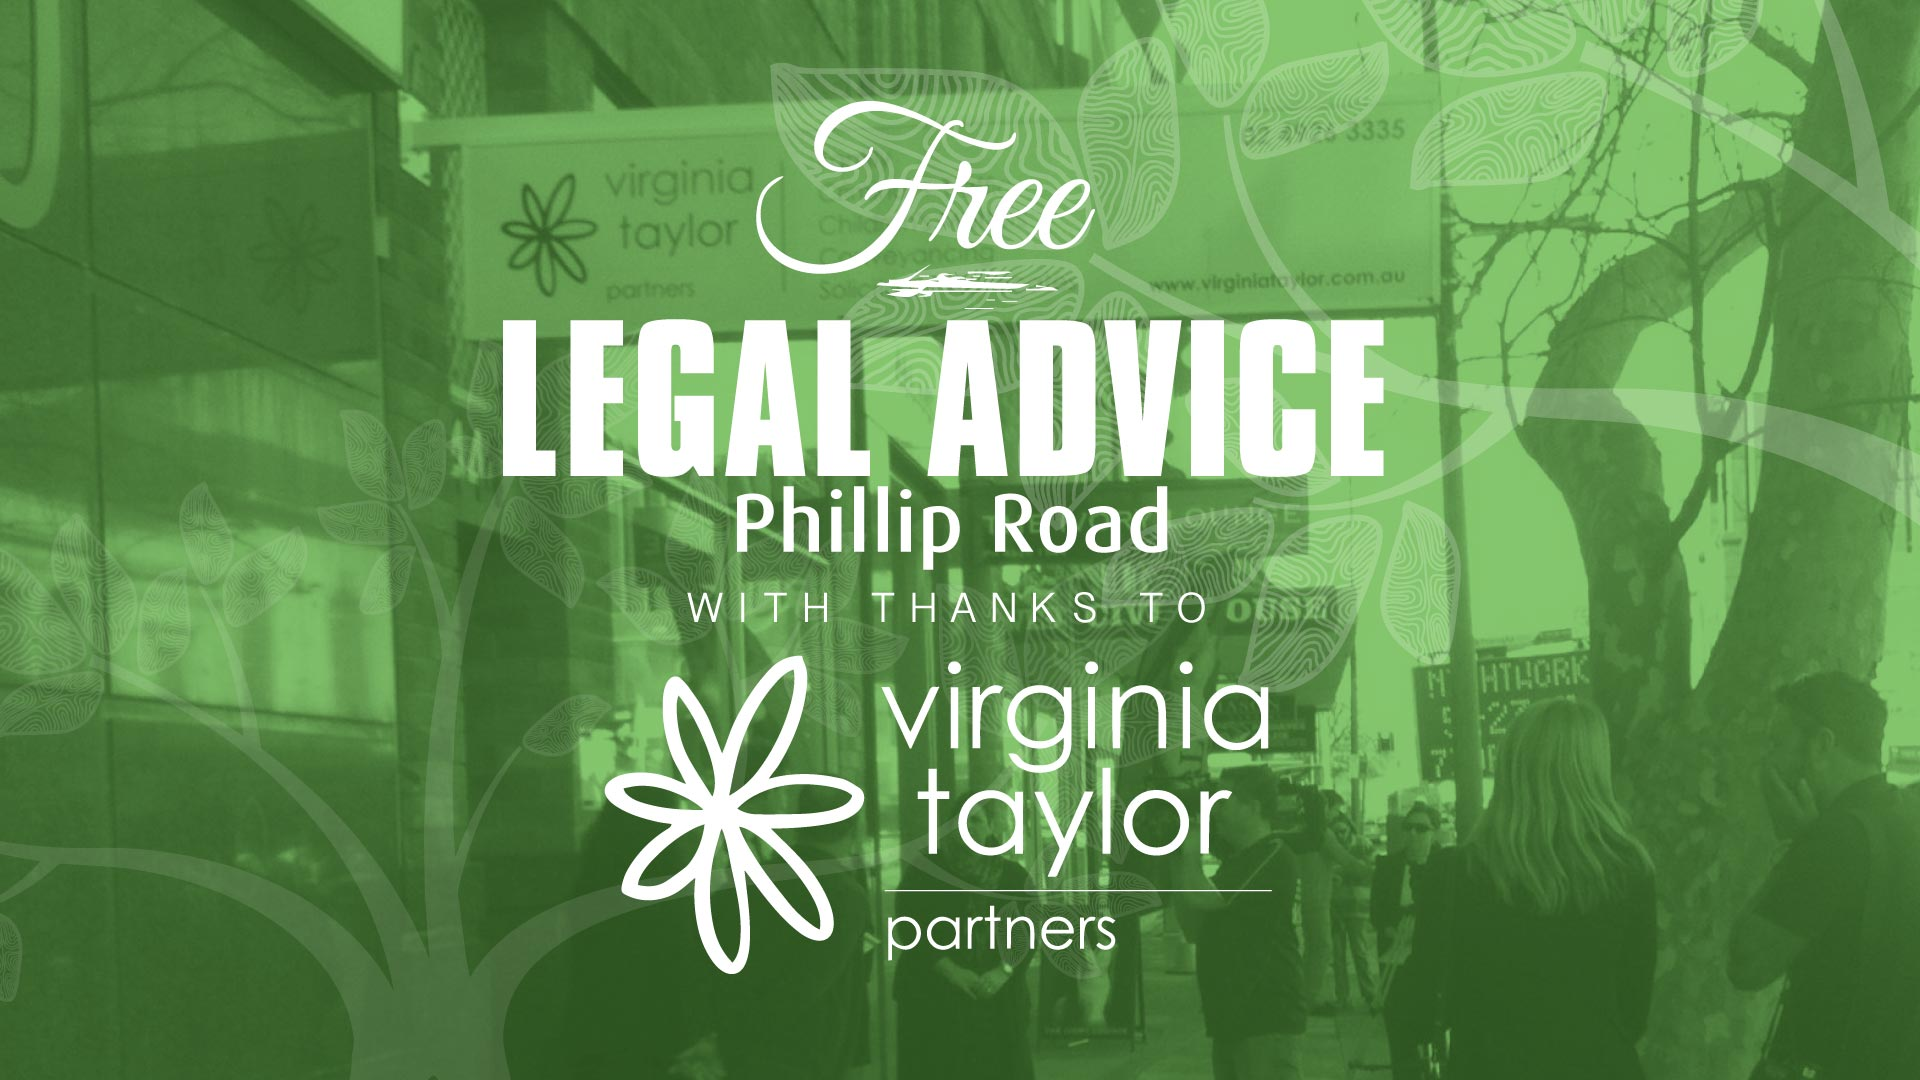 Virginia Taylor Partners